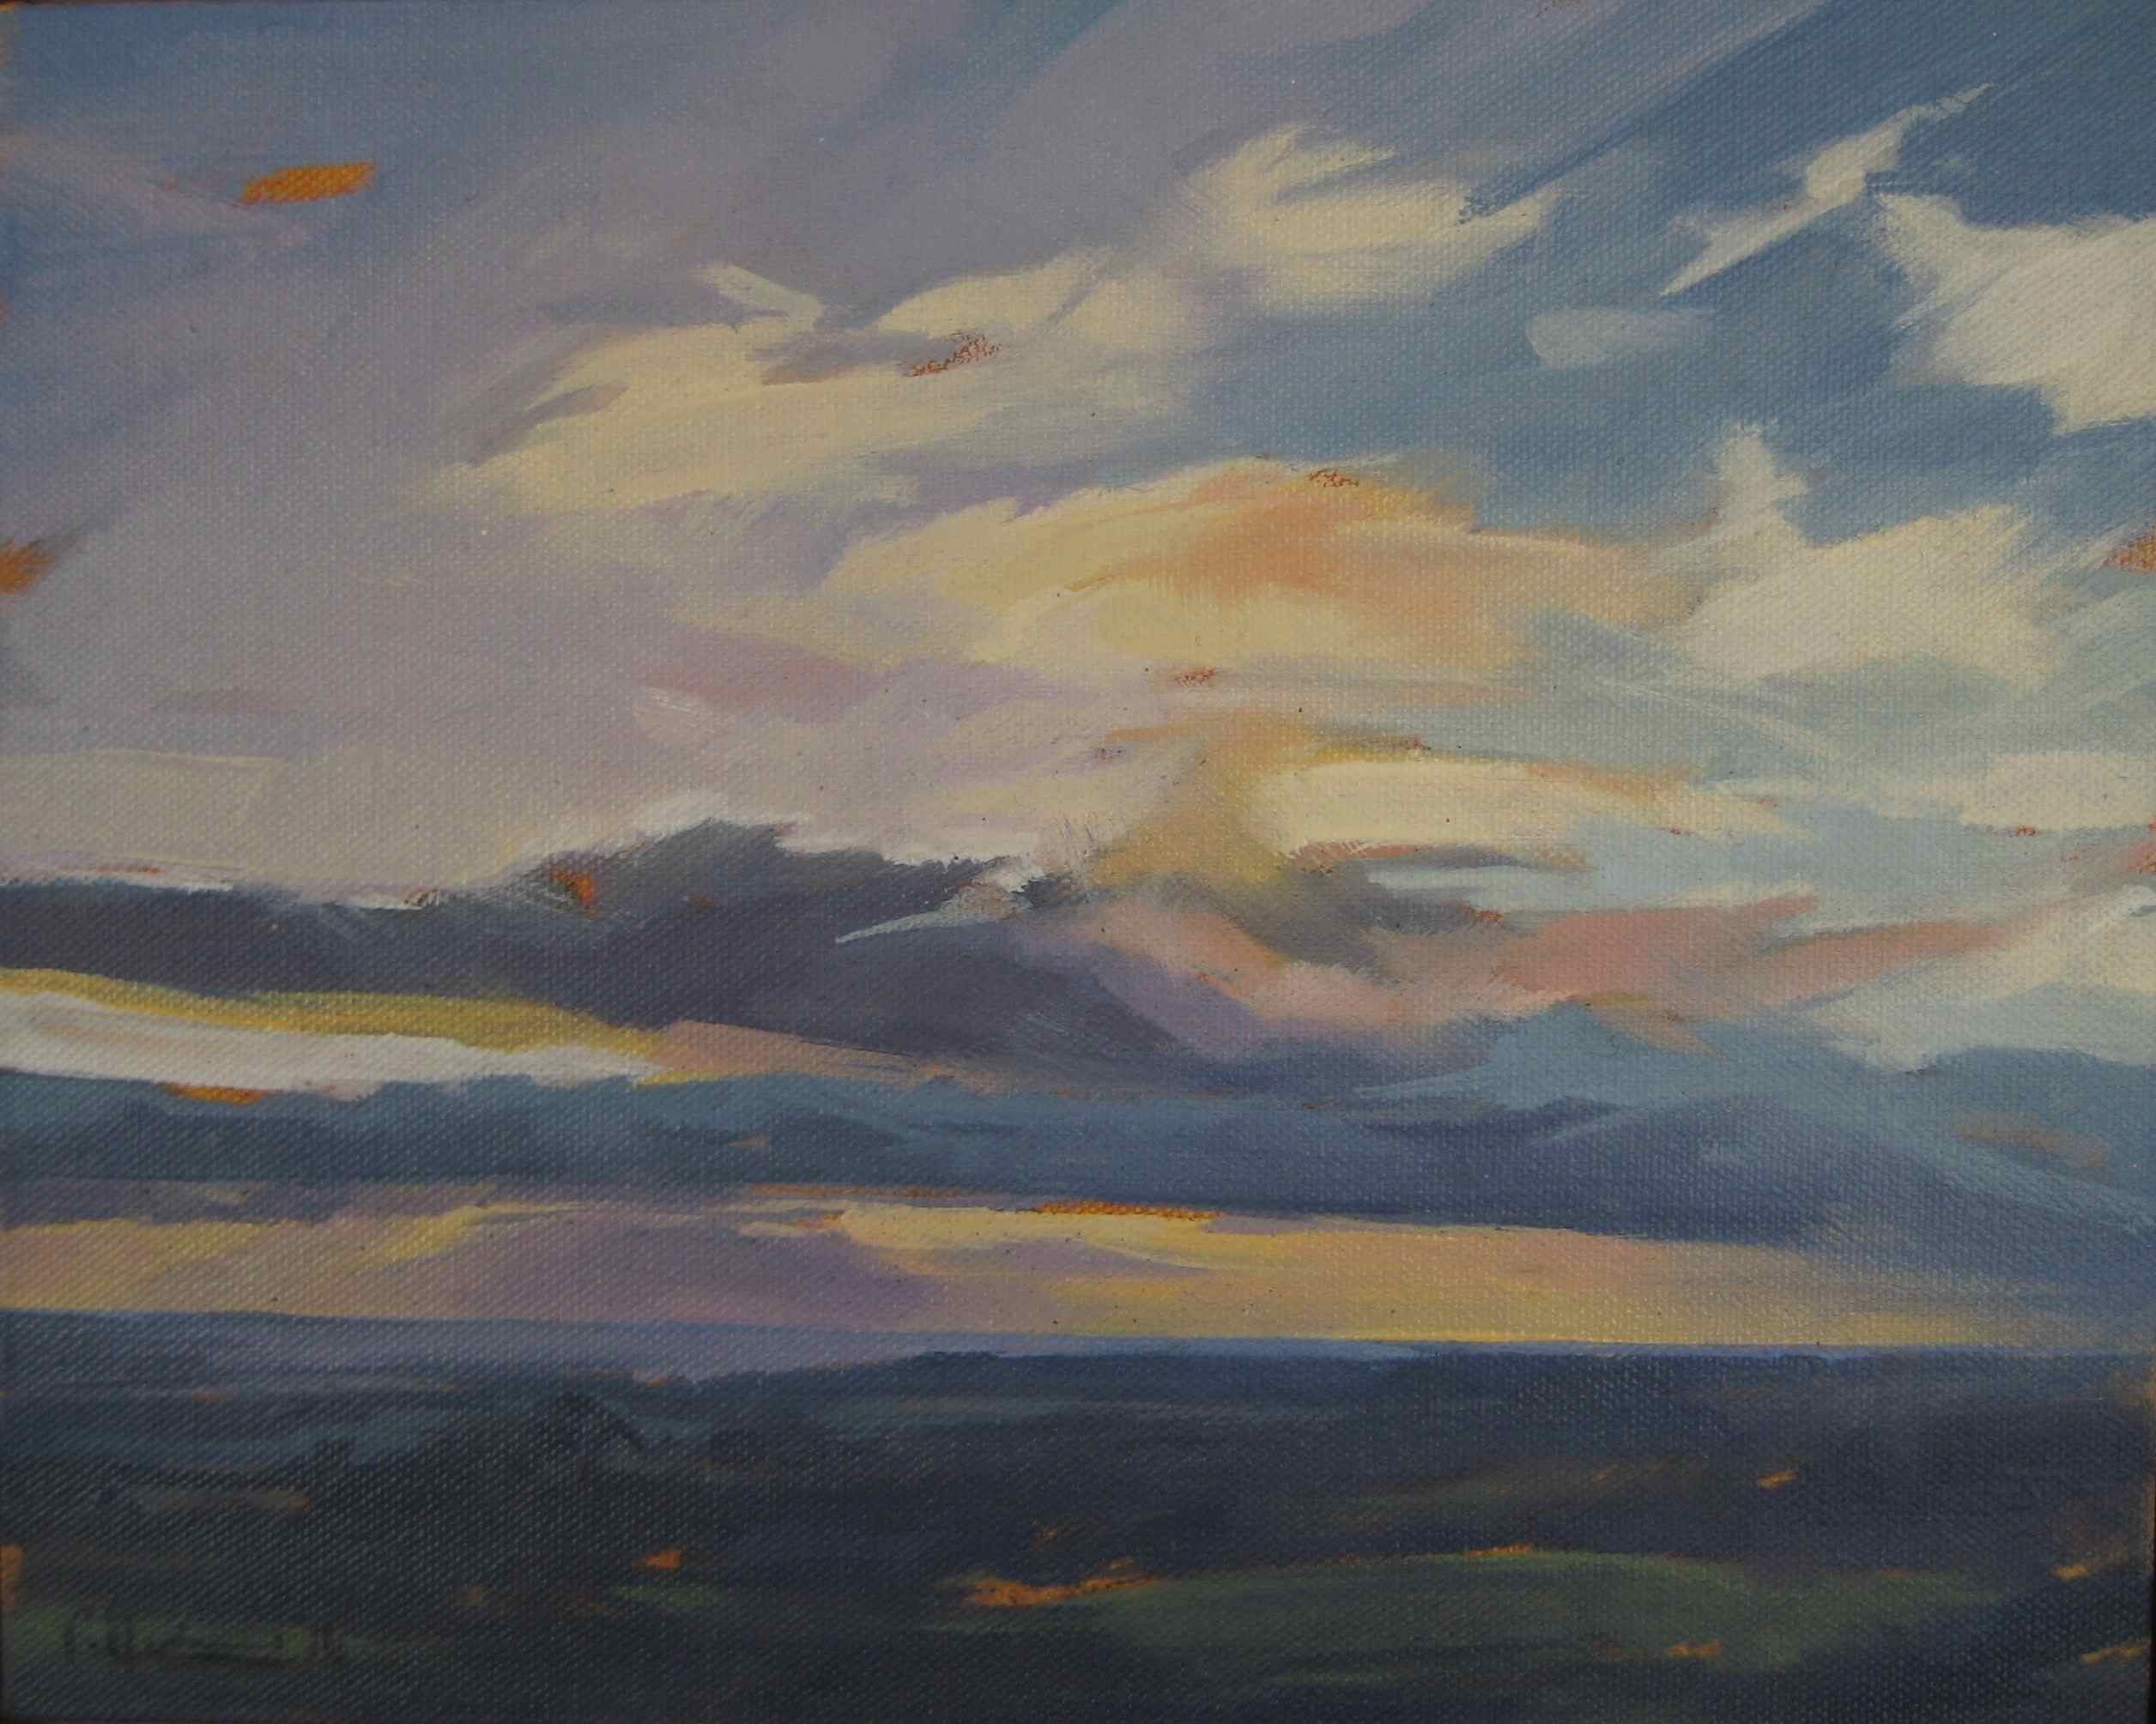 Tracey Quinn, Study Belshaws #2 20 x 25cm